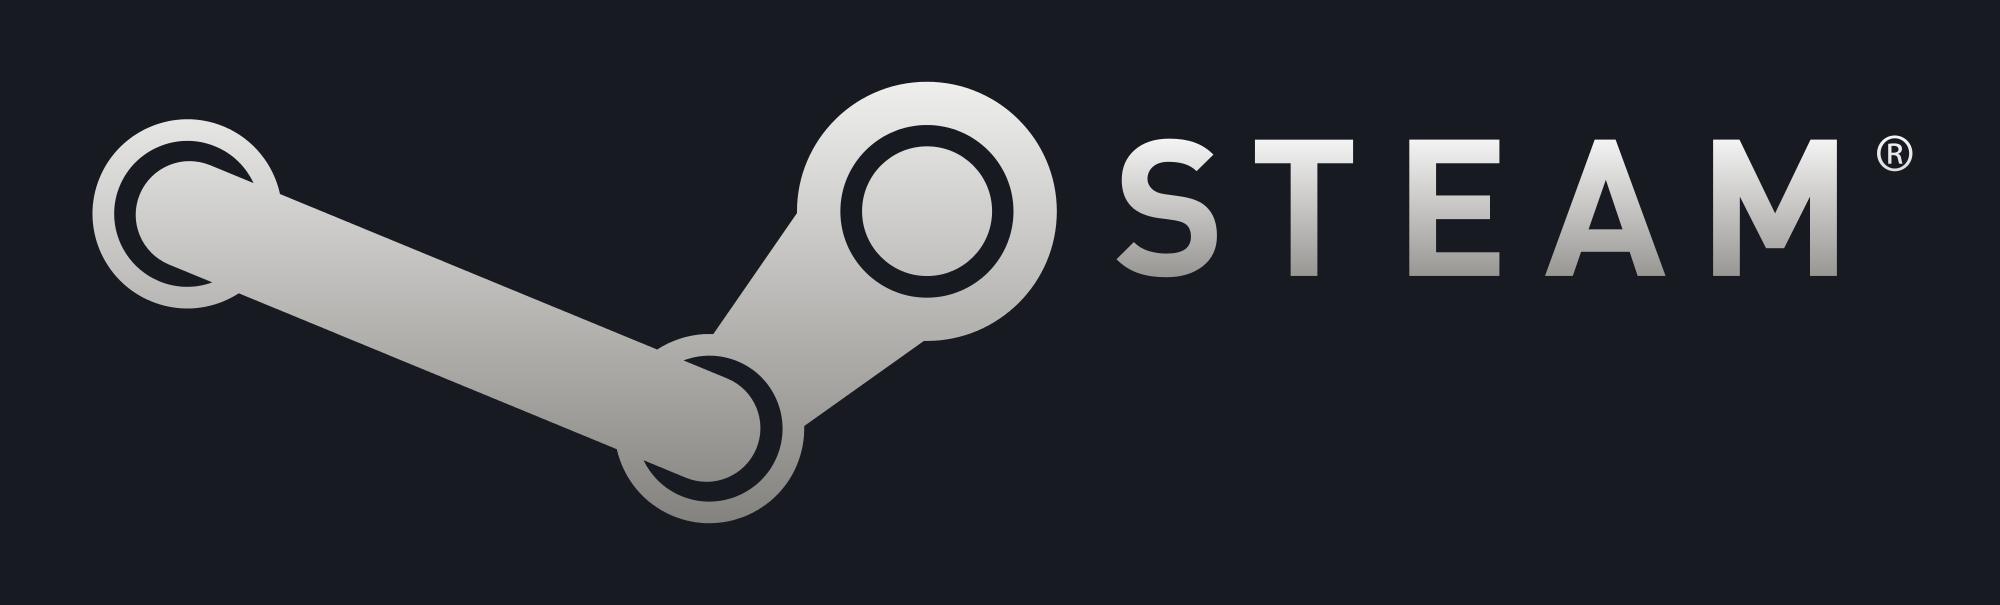 Steam Winter Sales เทศกาลลดราคาเกมส่งท้ายปี พบกันธันวาคมนี้